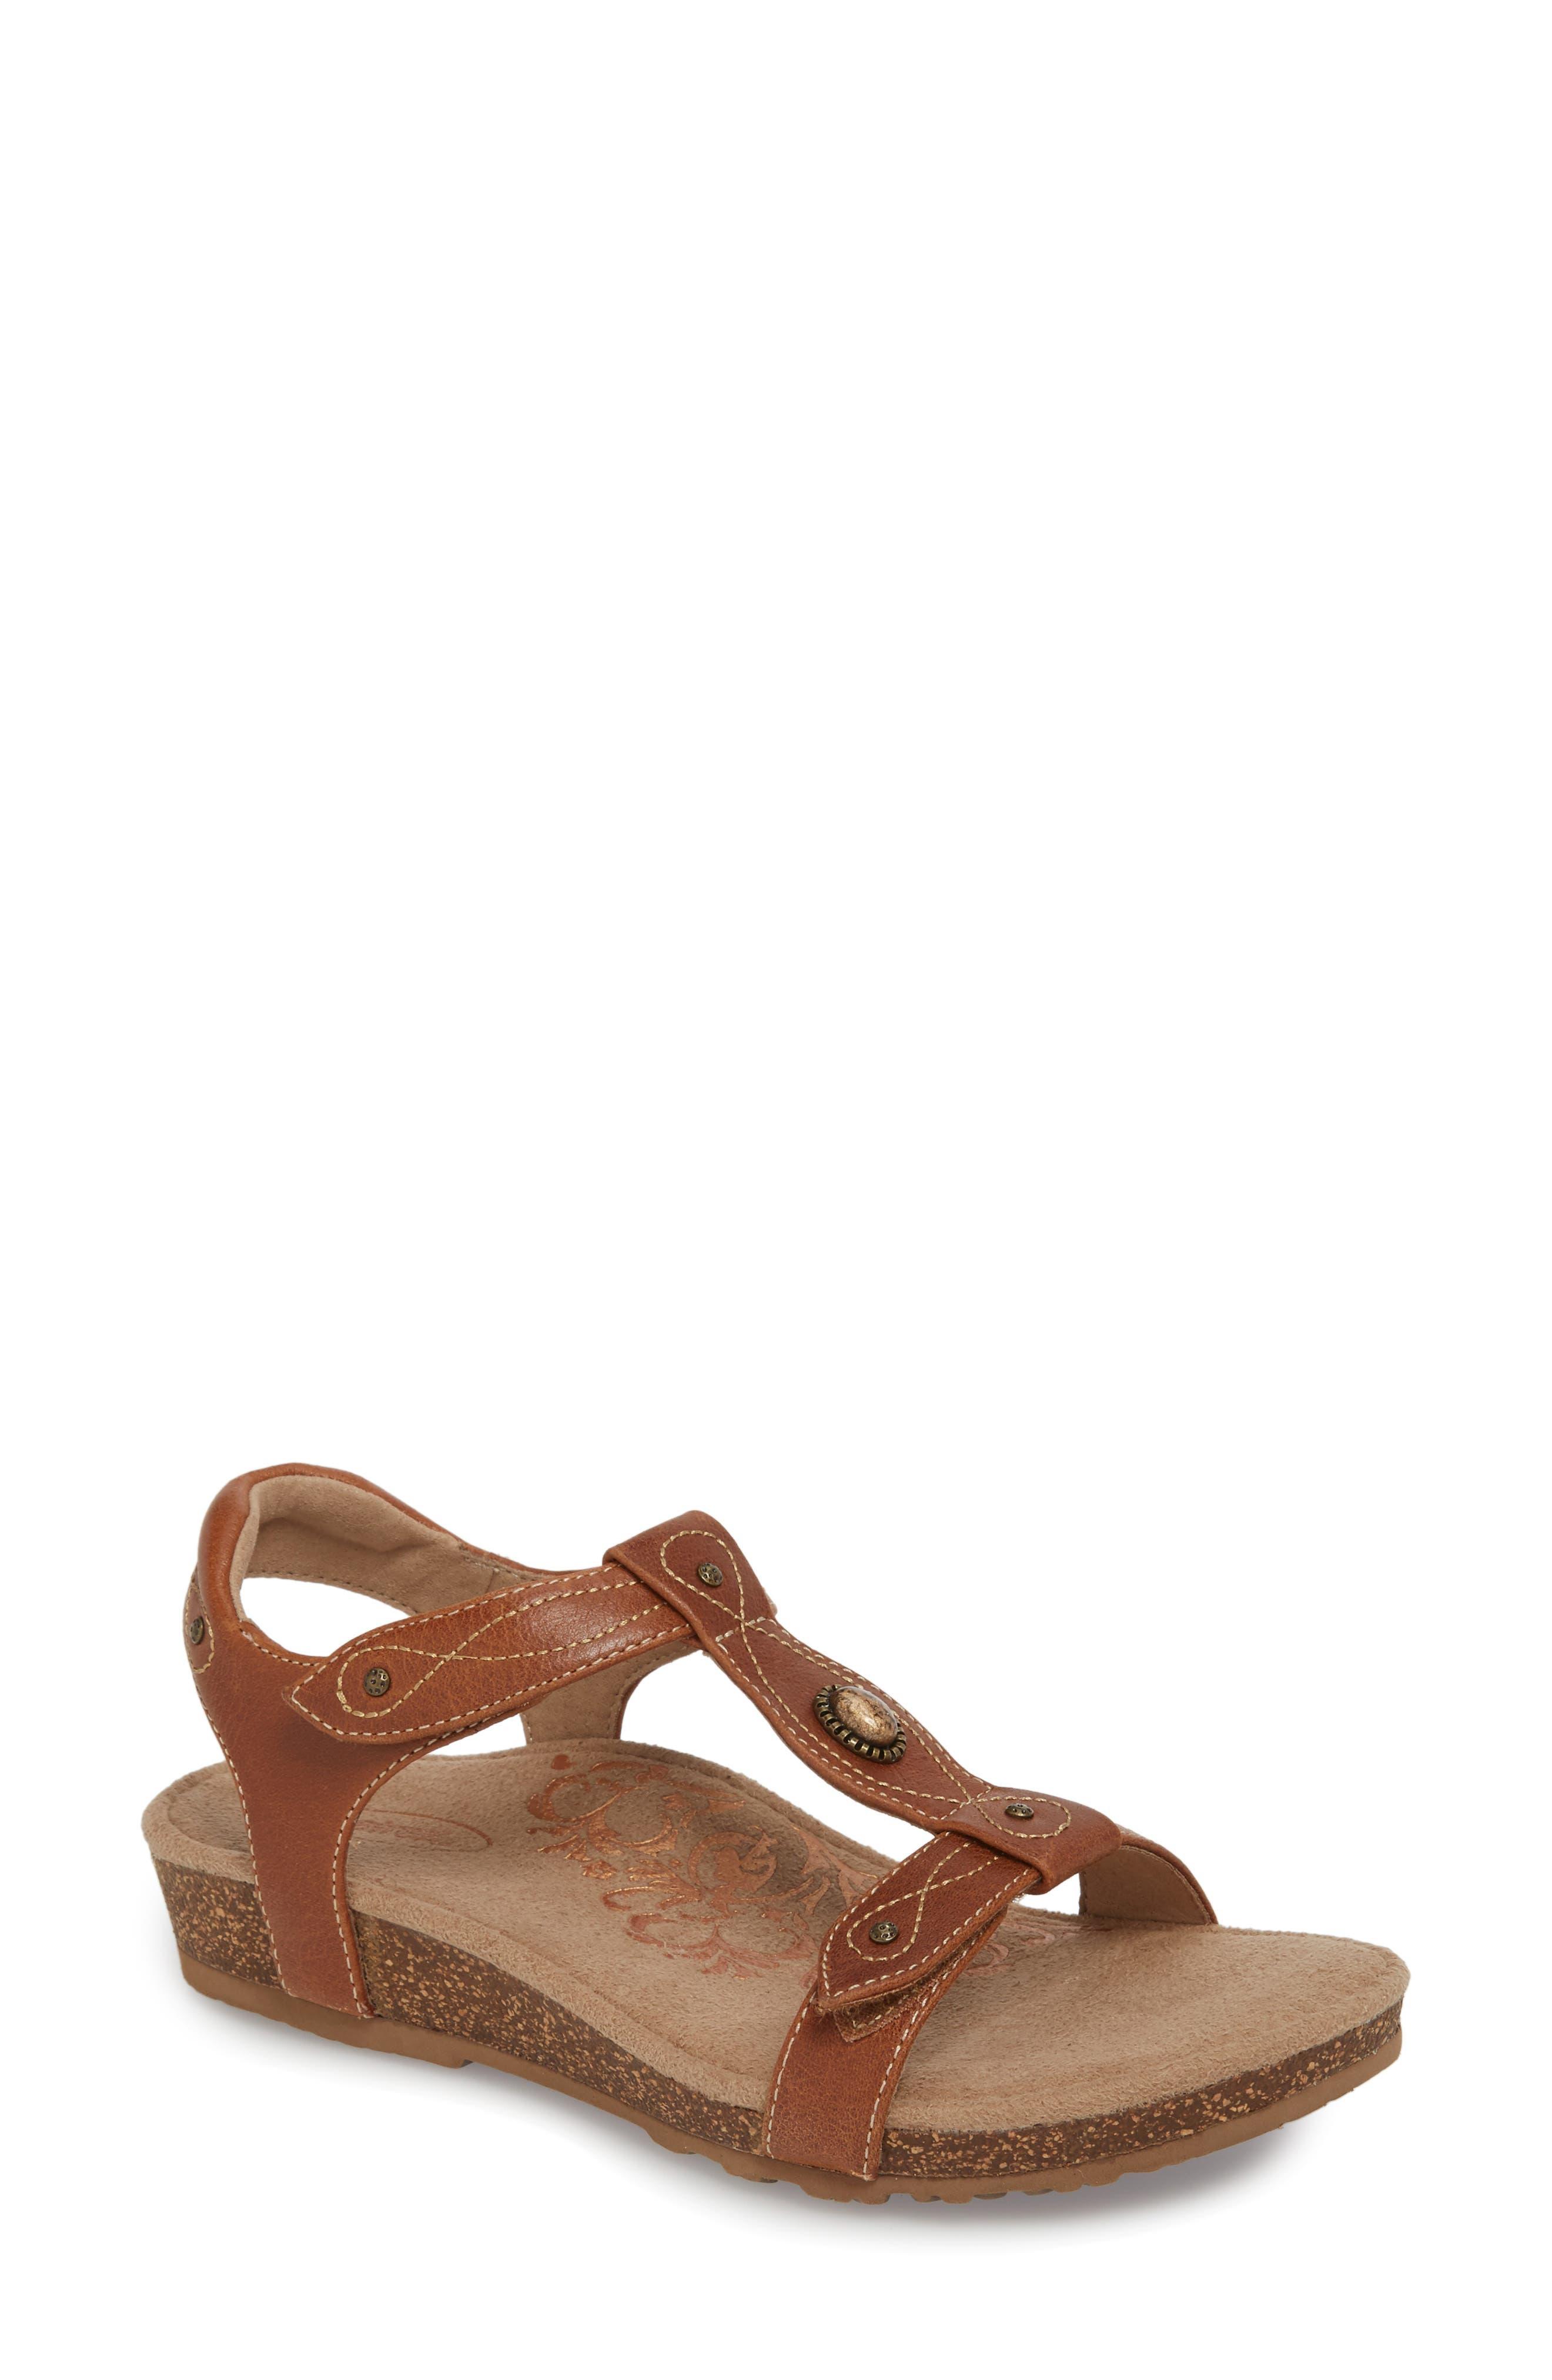 'Lori' Sandal,                         Main,                         color, Cognac Leather